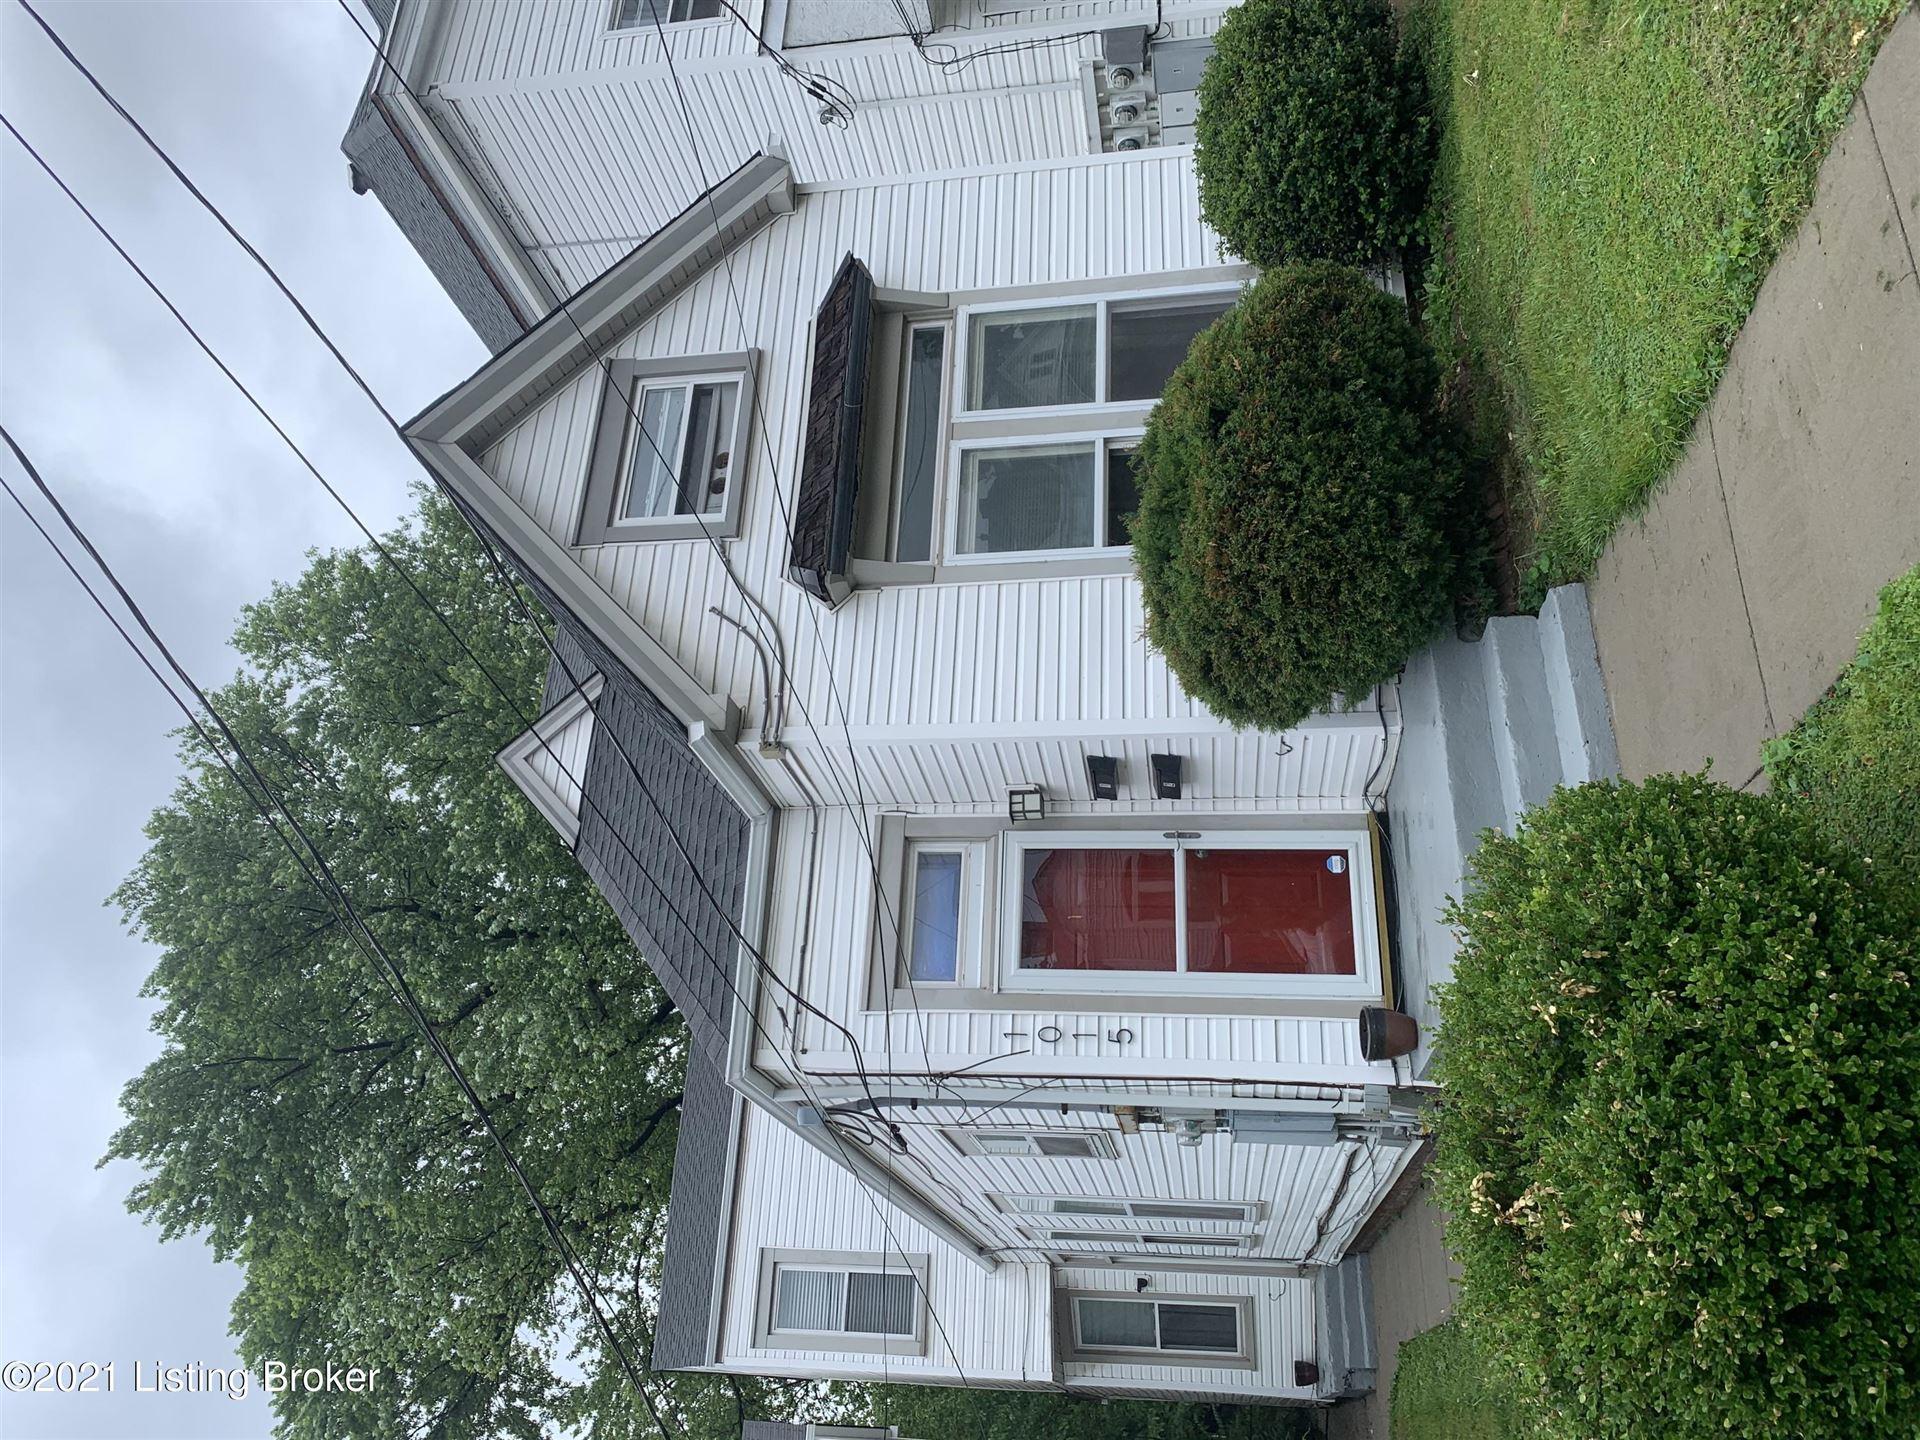 Photo for 1015 E Breckinridge St #2, Louisville, KY 40204 (MLS # 1587175)